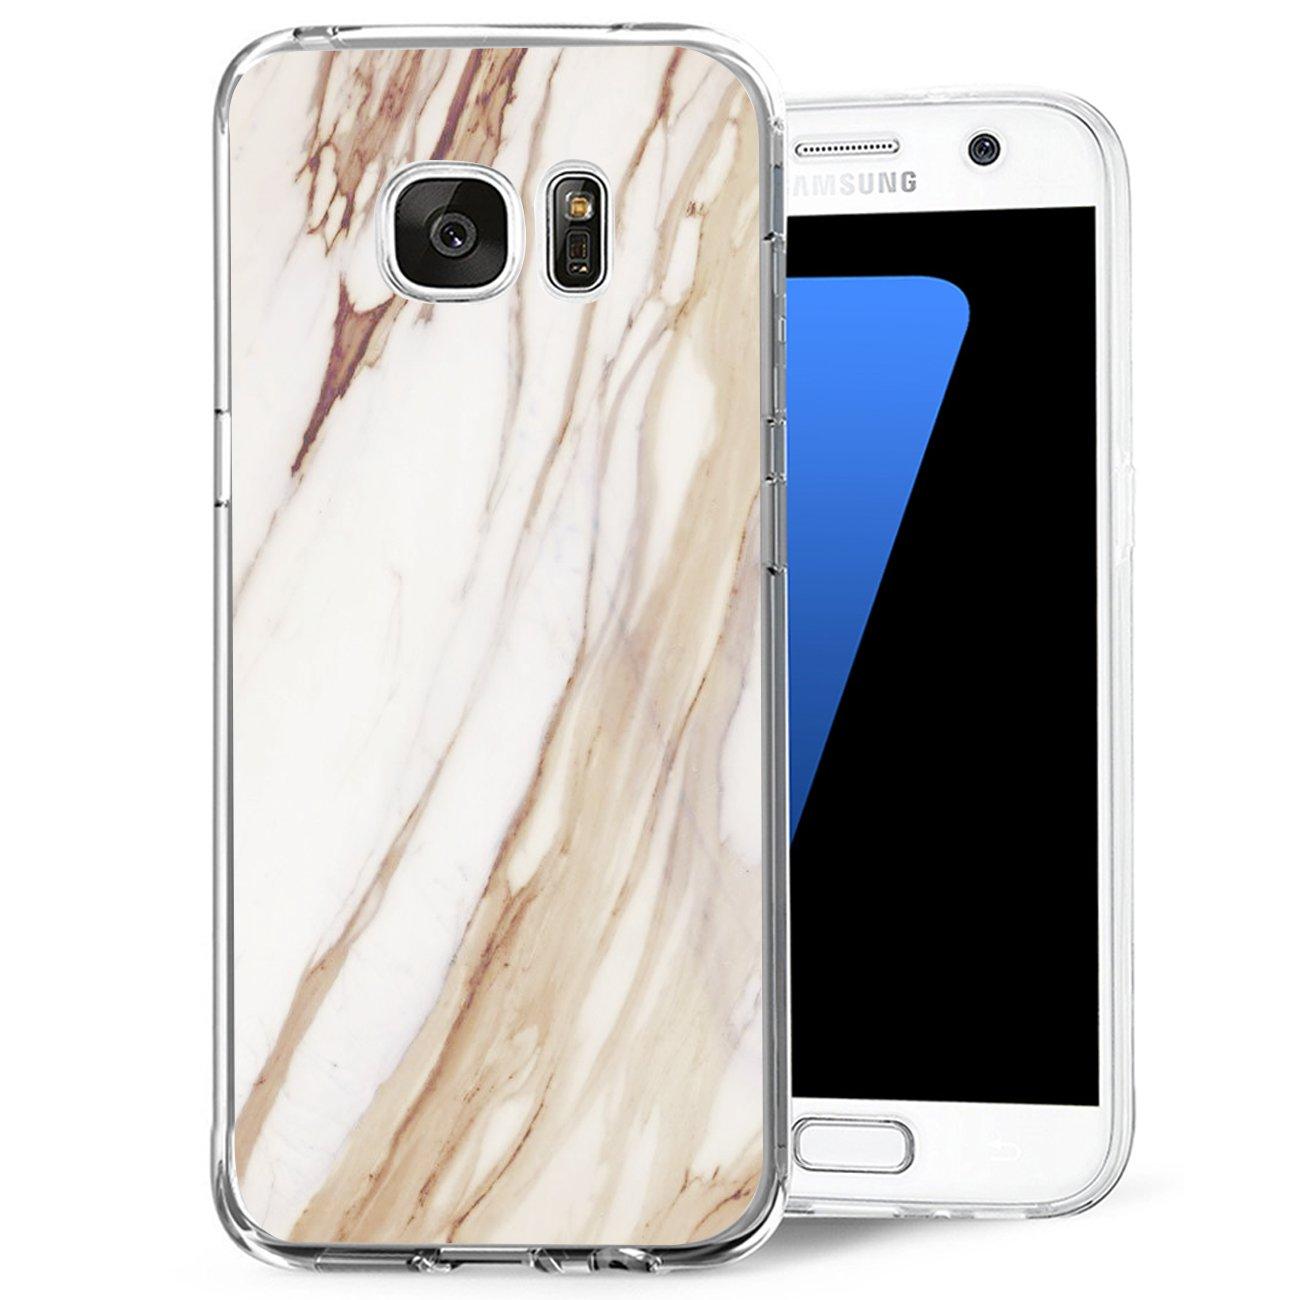 13peas Galaxy S7 Hülle, S7 Handyhüllen Crystal Clear Ultra Dünn Flexibel Silikon Case Transparent TPU Weiche Schutzhülle Slimcase Tasche für Galaxy S7/S6 13peas Galaxy S7 Hülle